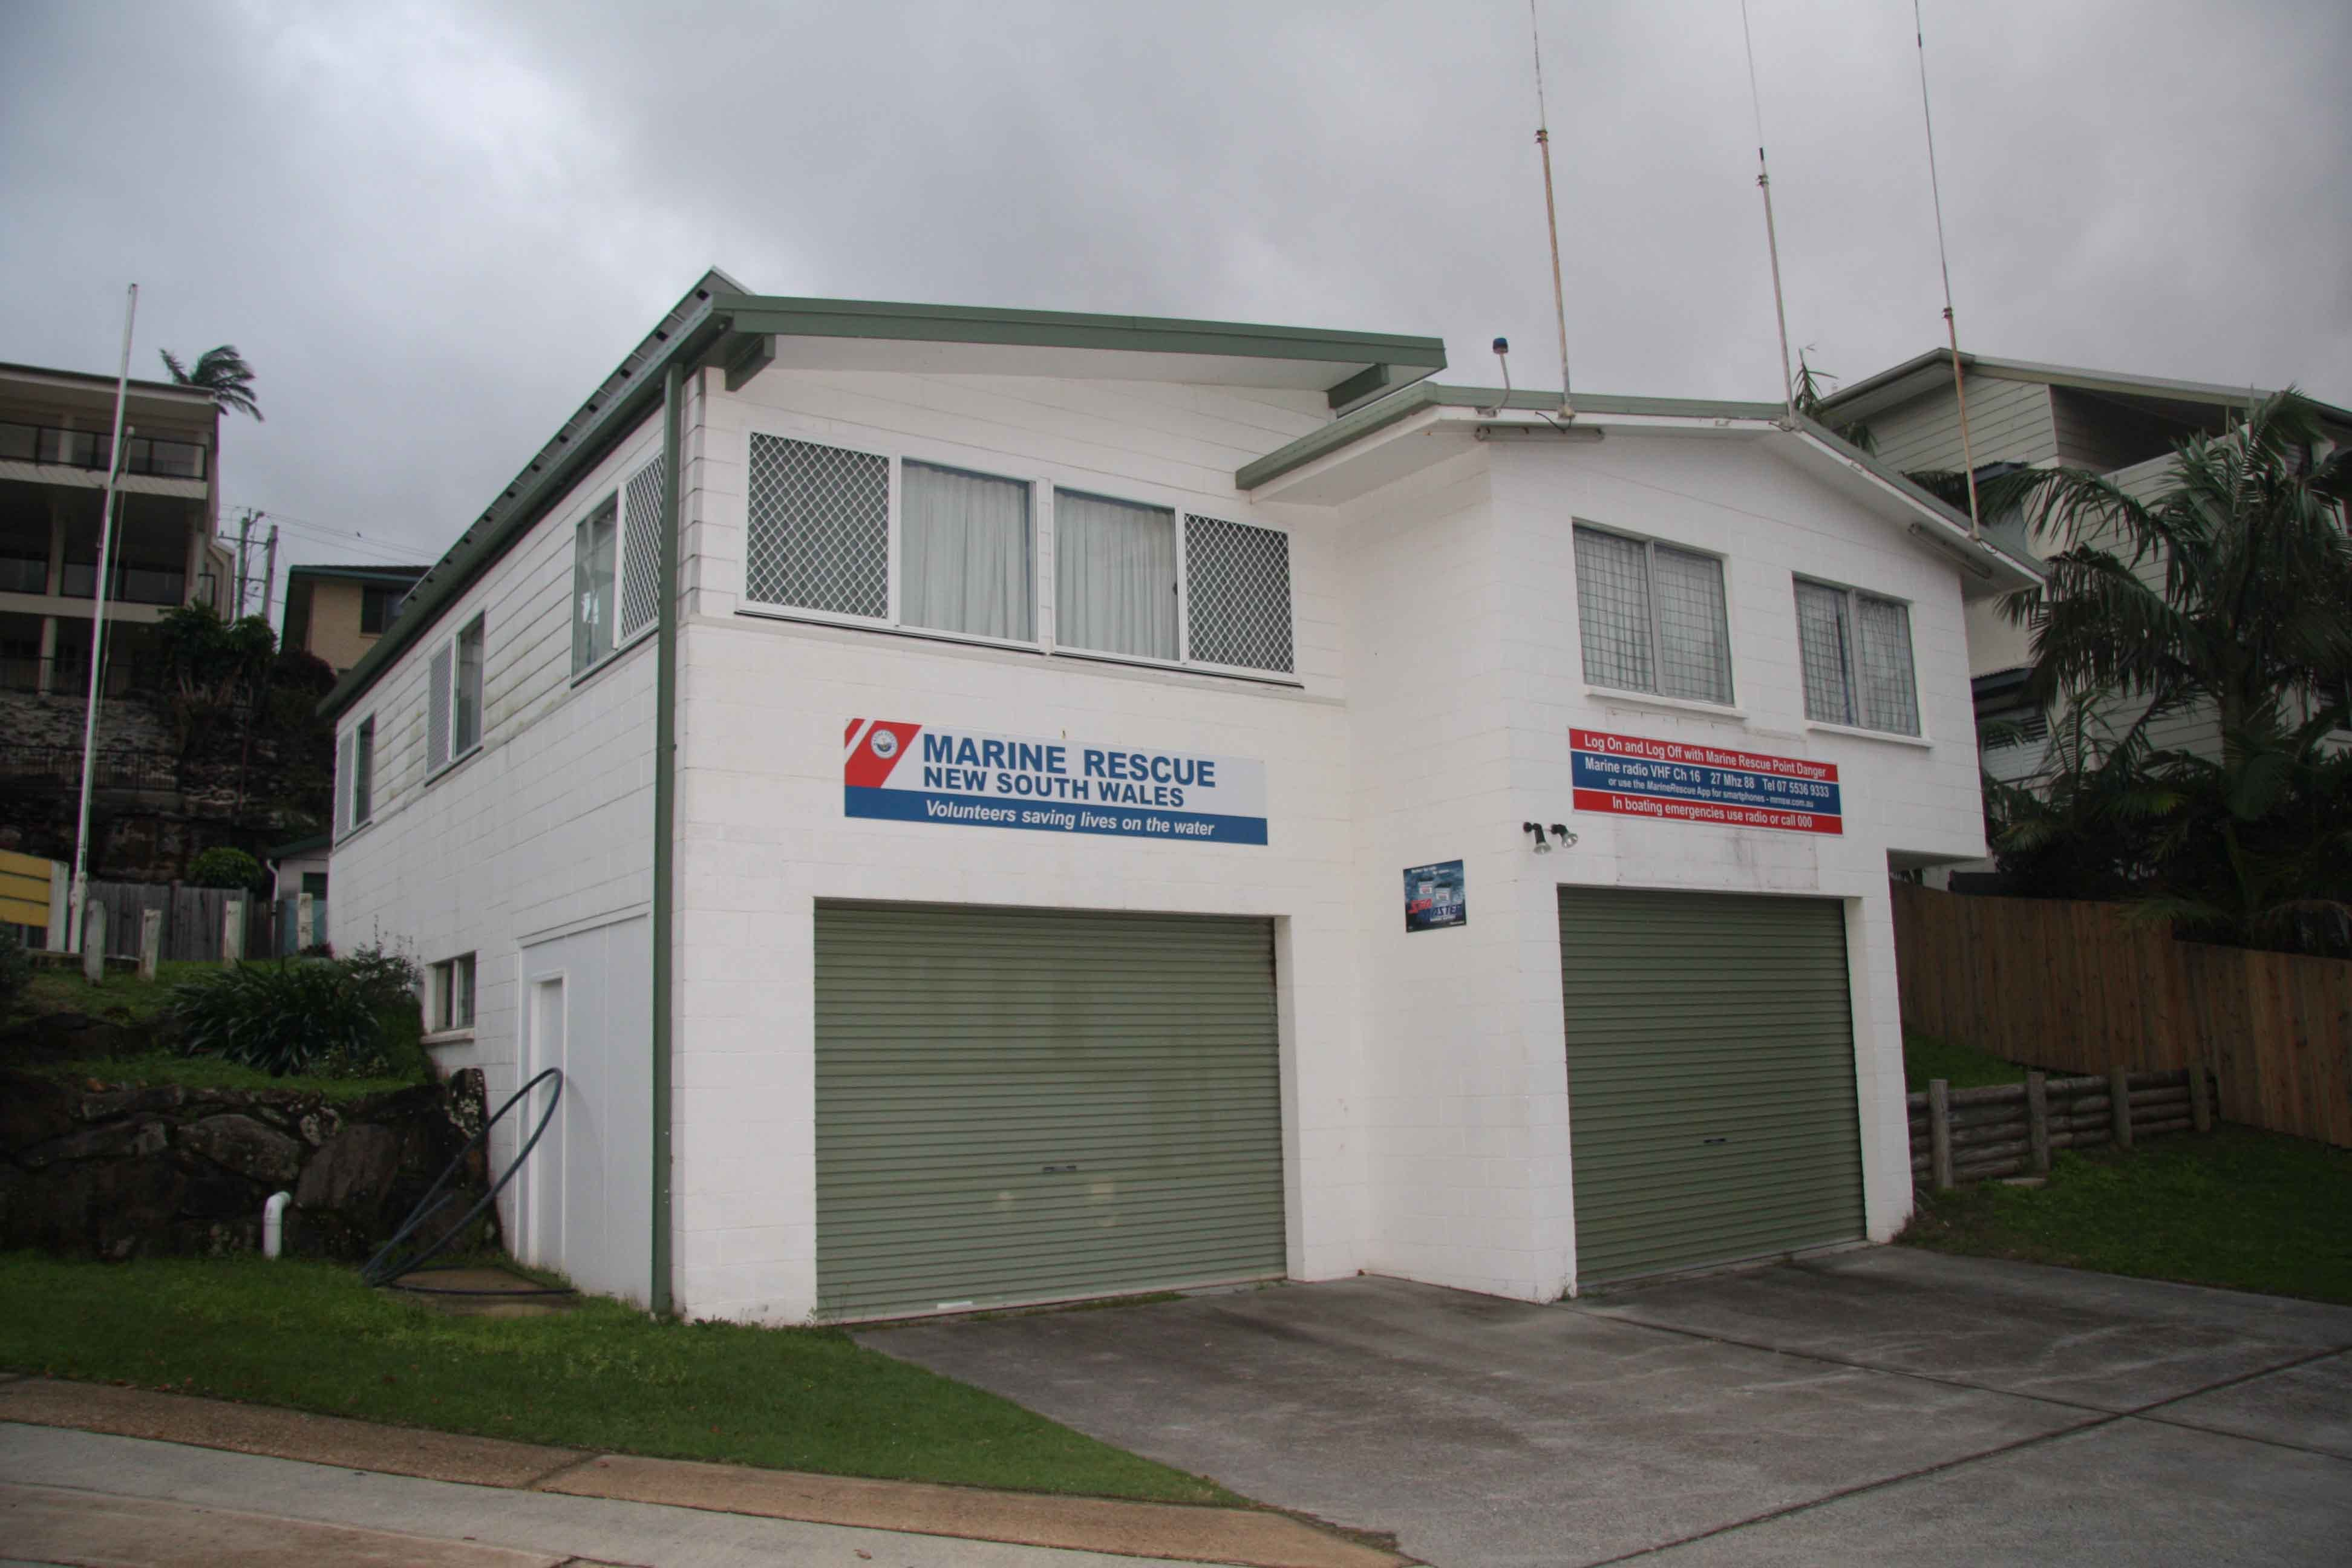 Kingscliff Coast Guard training building